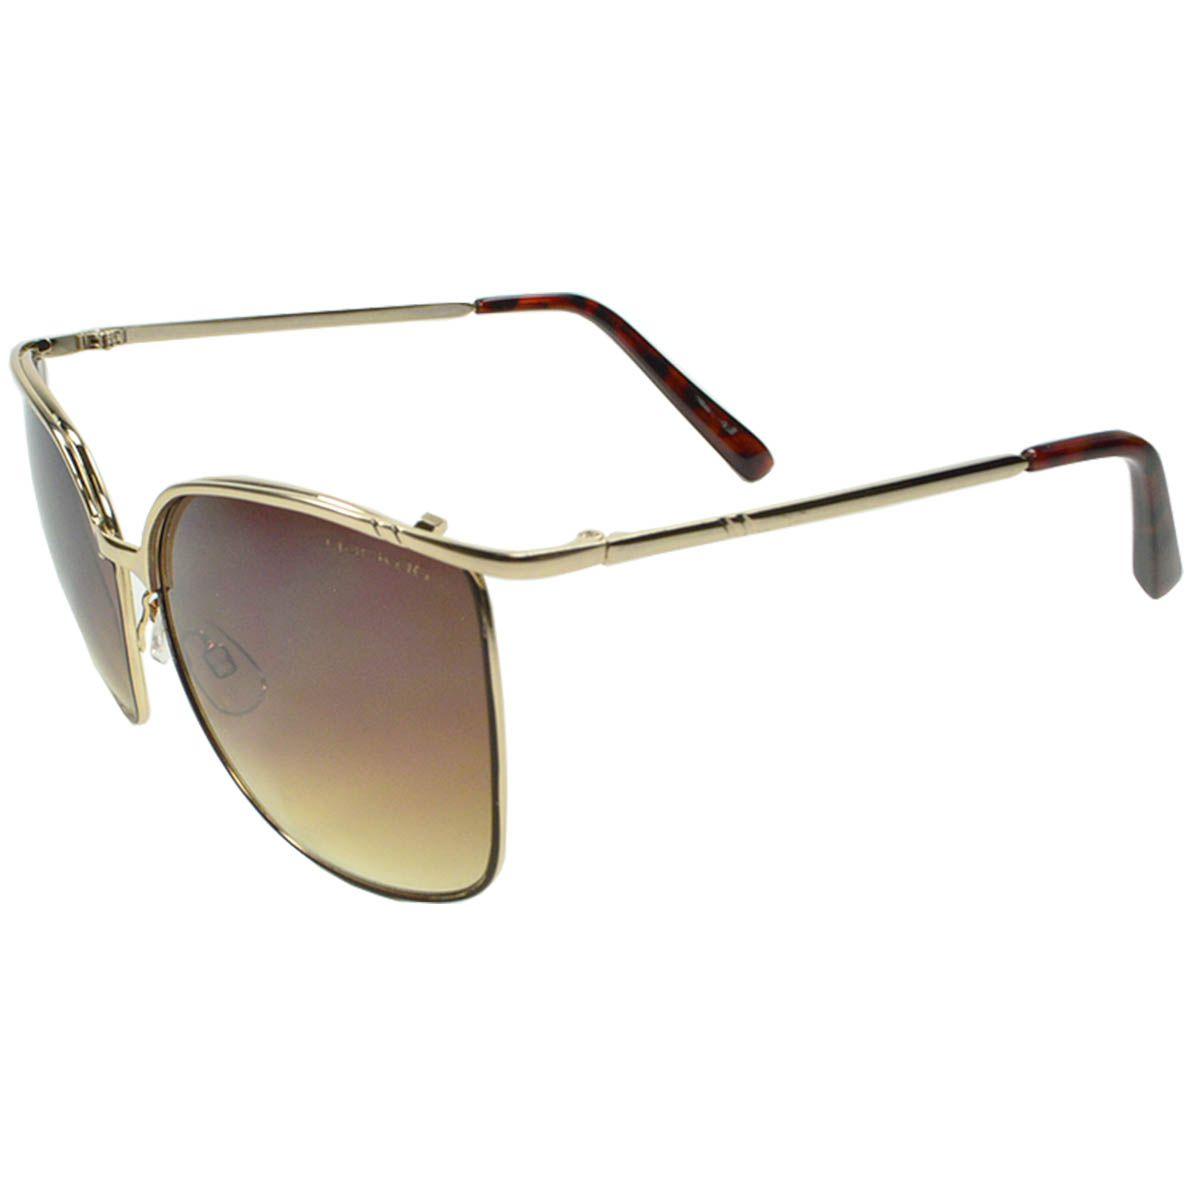 87a64db3a Óculos de Sol Feminino Mackage MK6233D Dourado